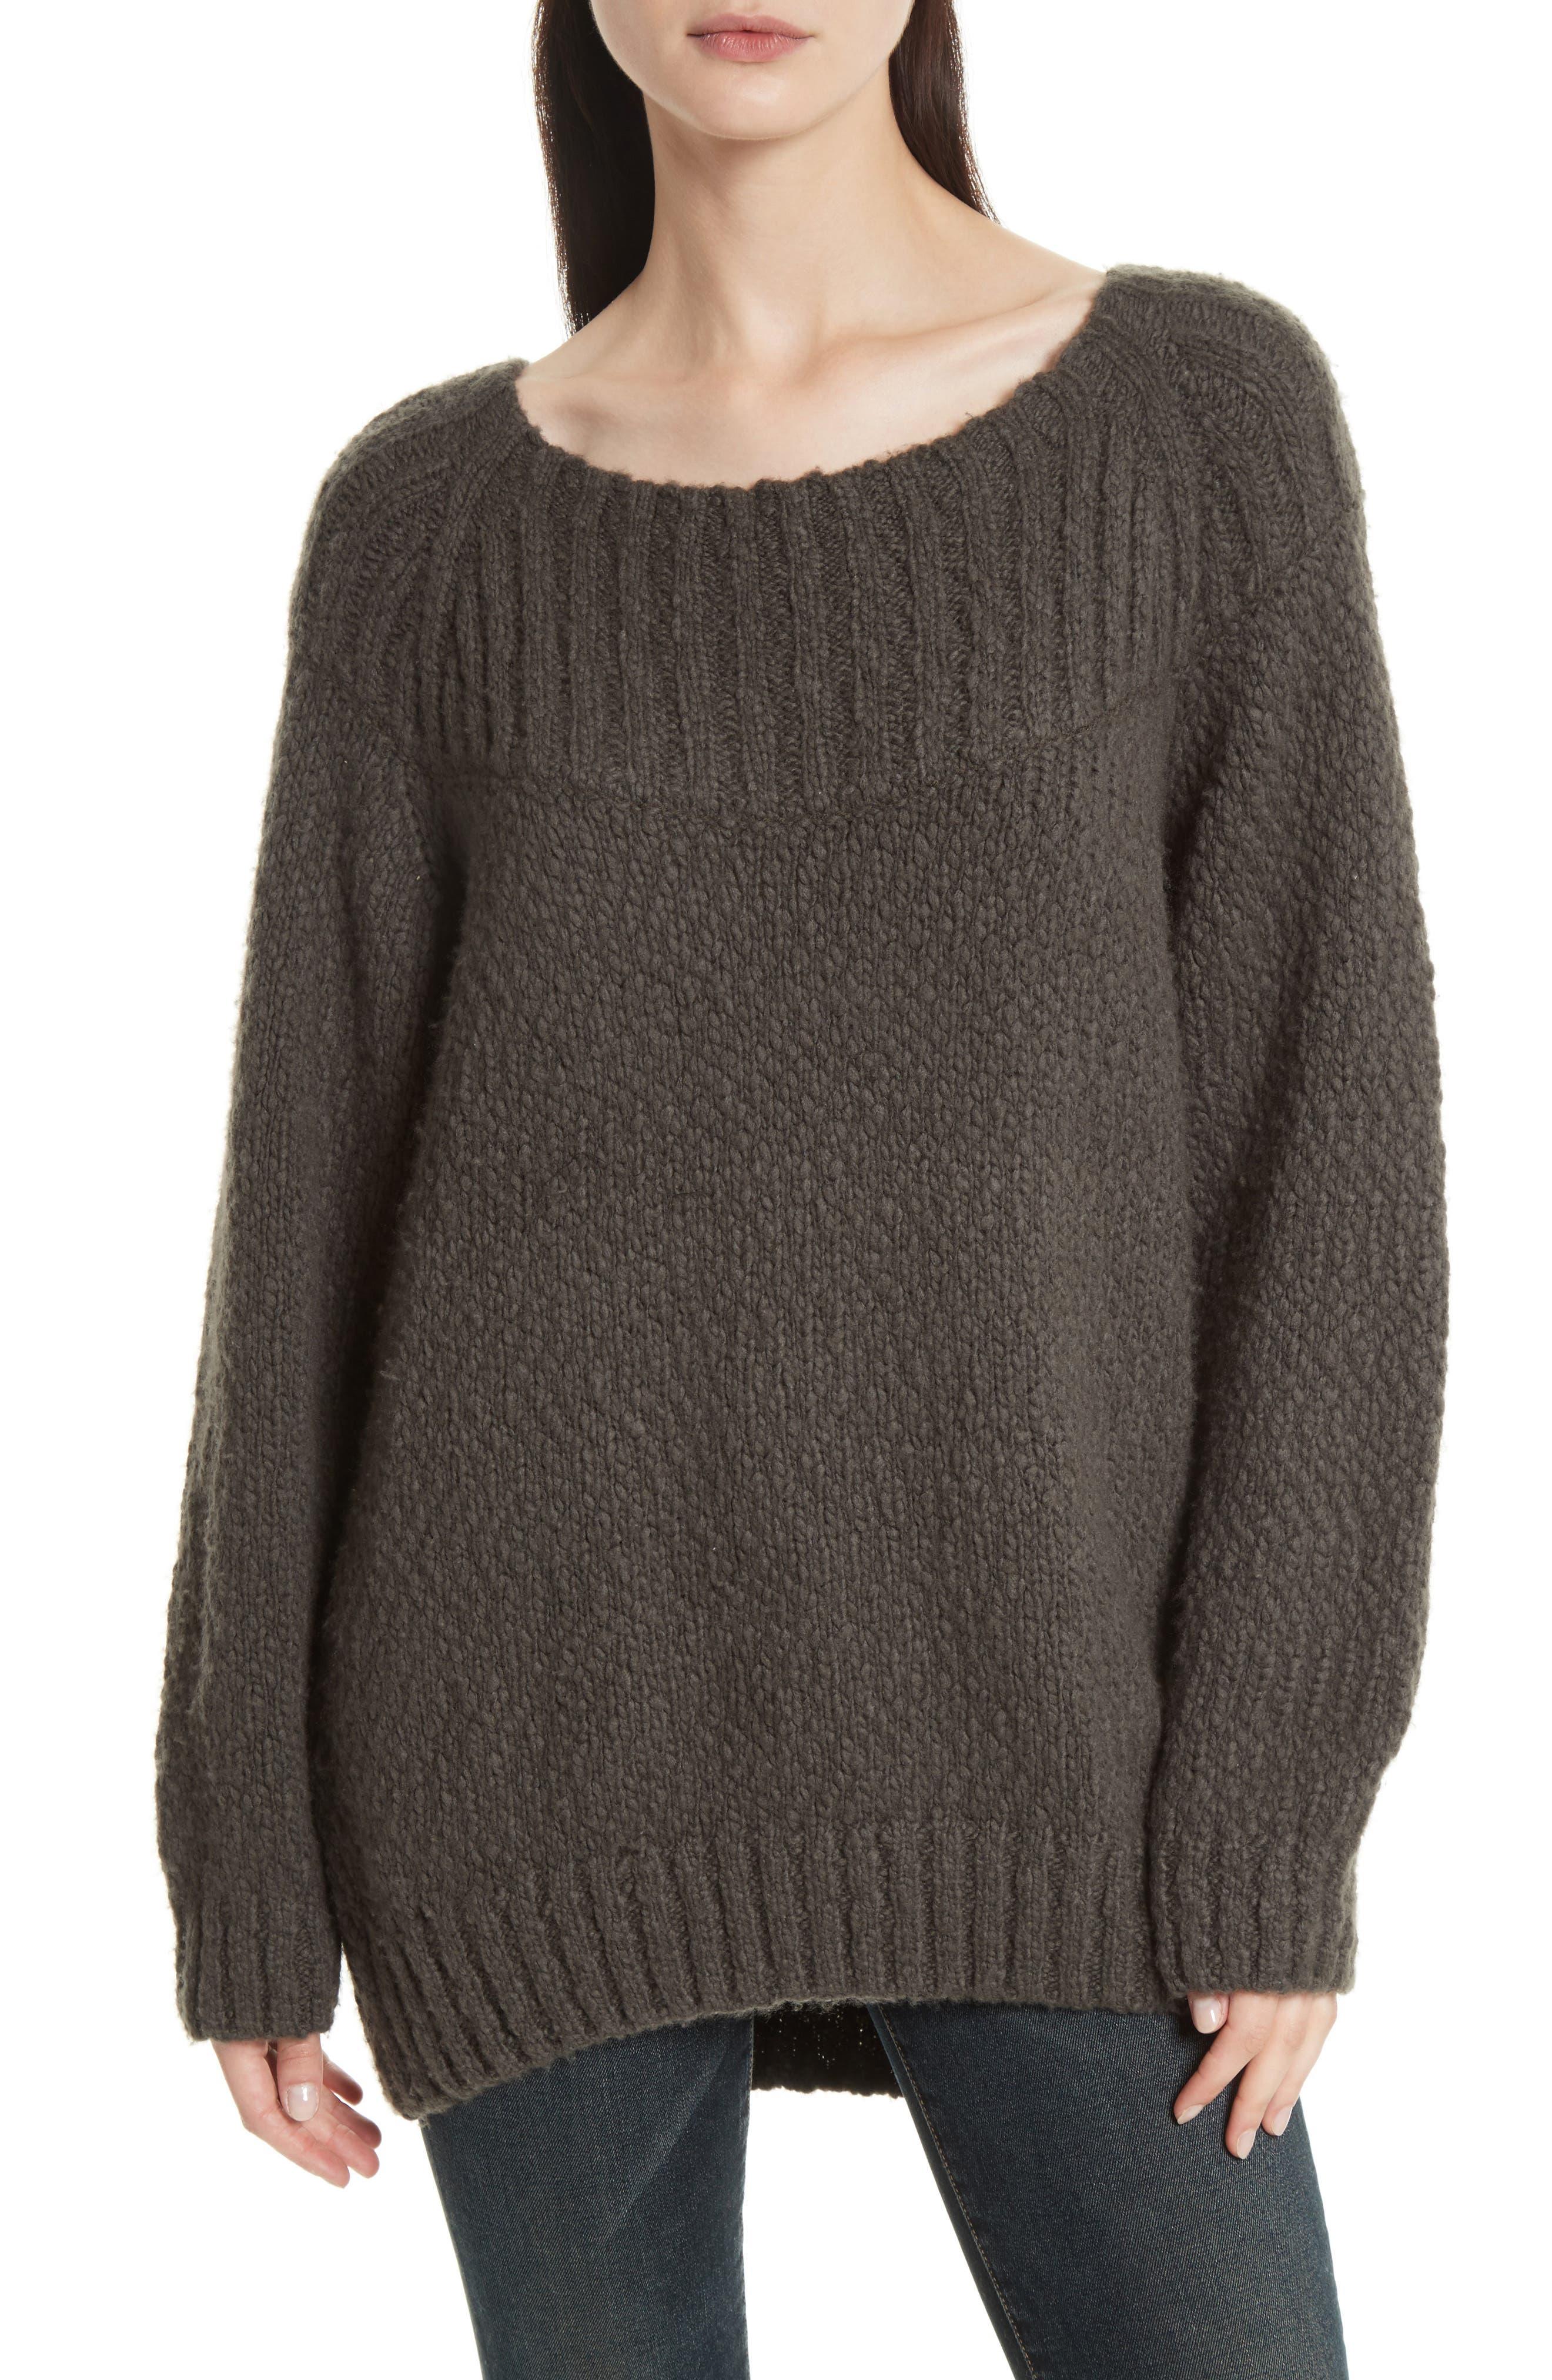 Ribbed Yoke Knit Sweater,                             Main thumbnail 1, color,                             082